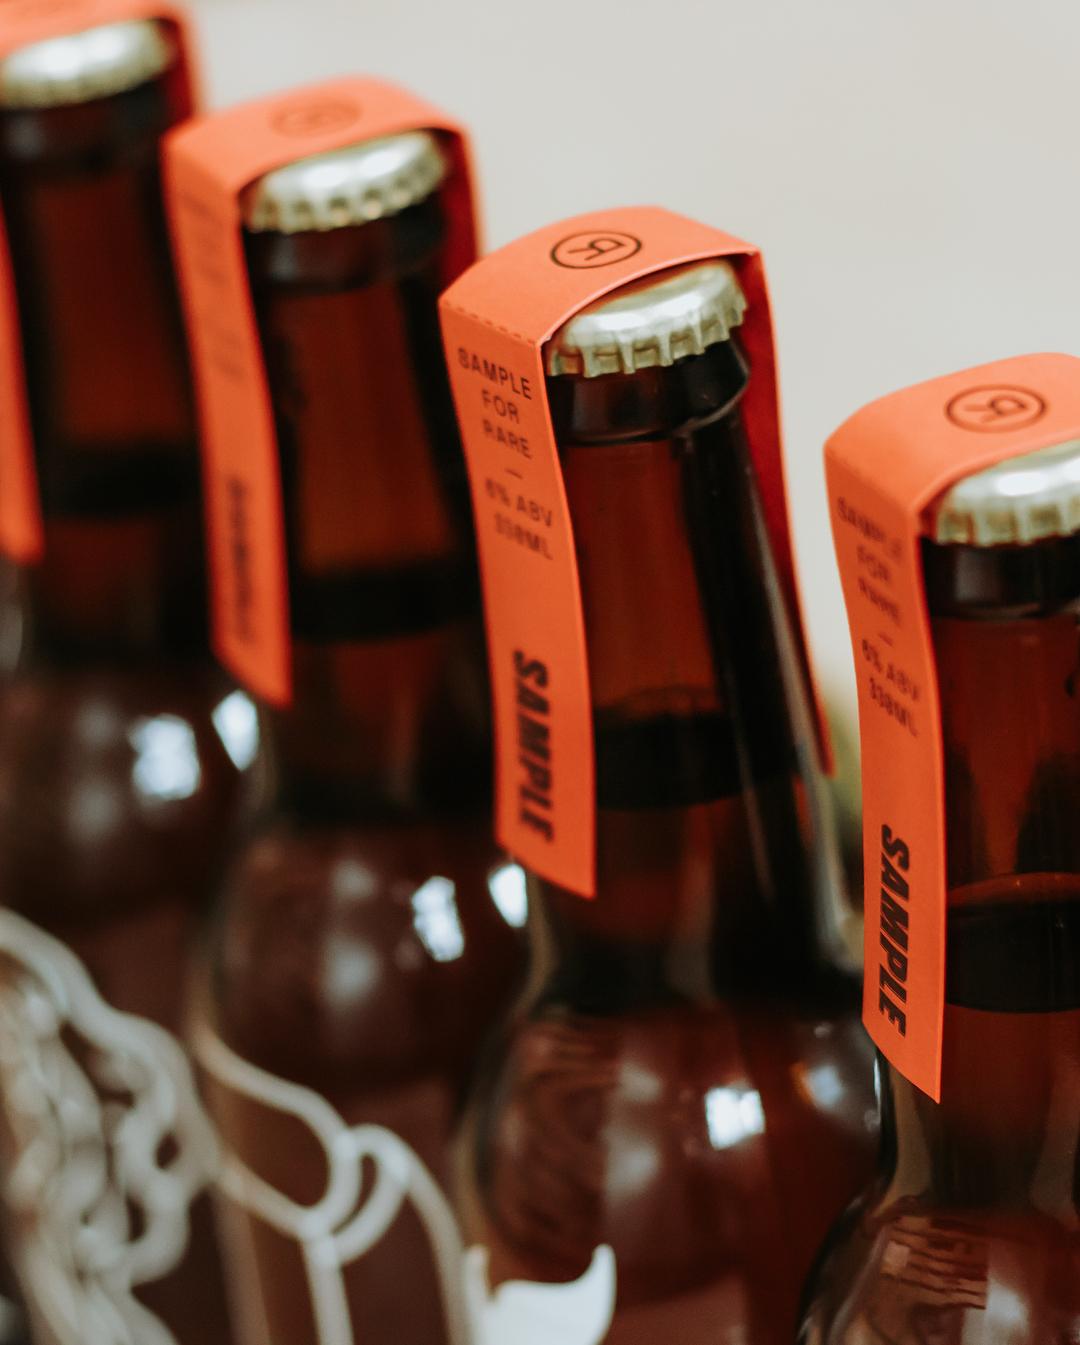 Specialty letterpress beer neck labels for Sample Brew on Colorplan 3